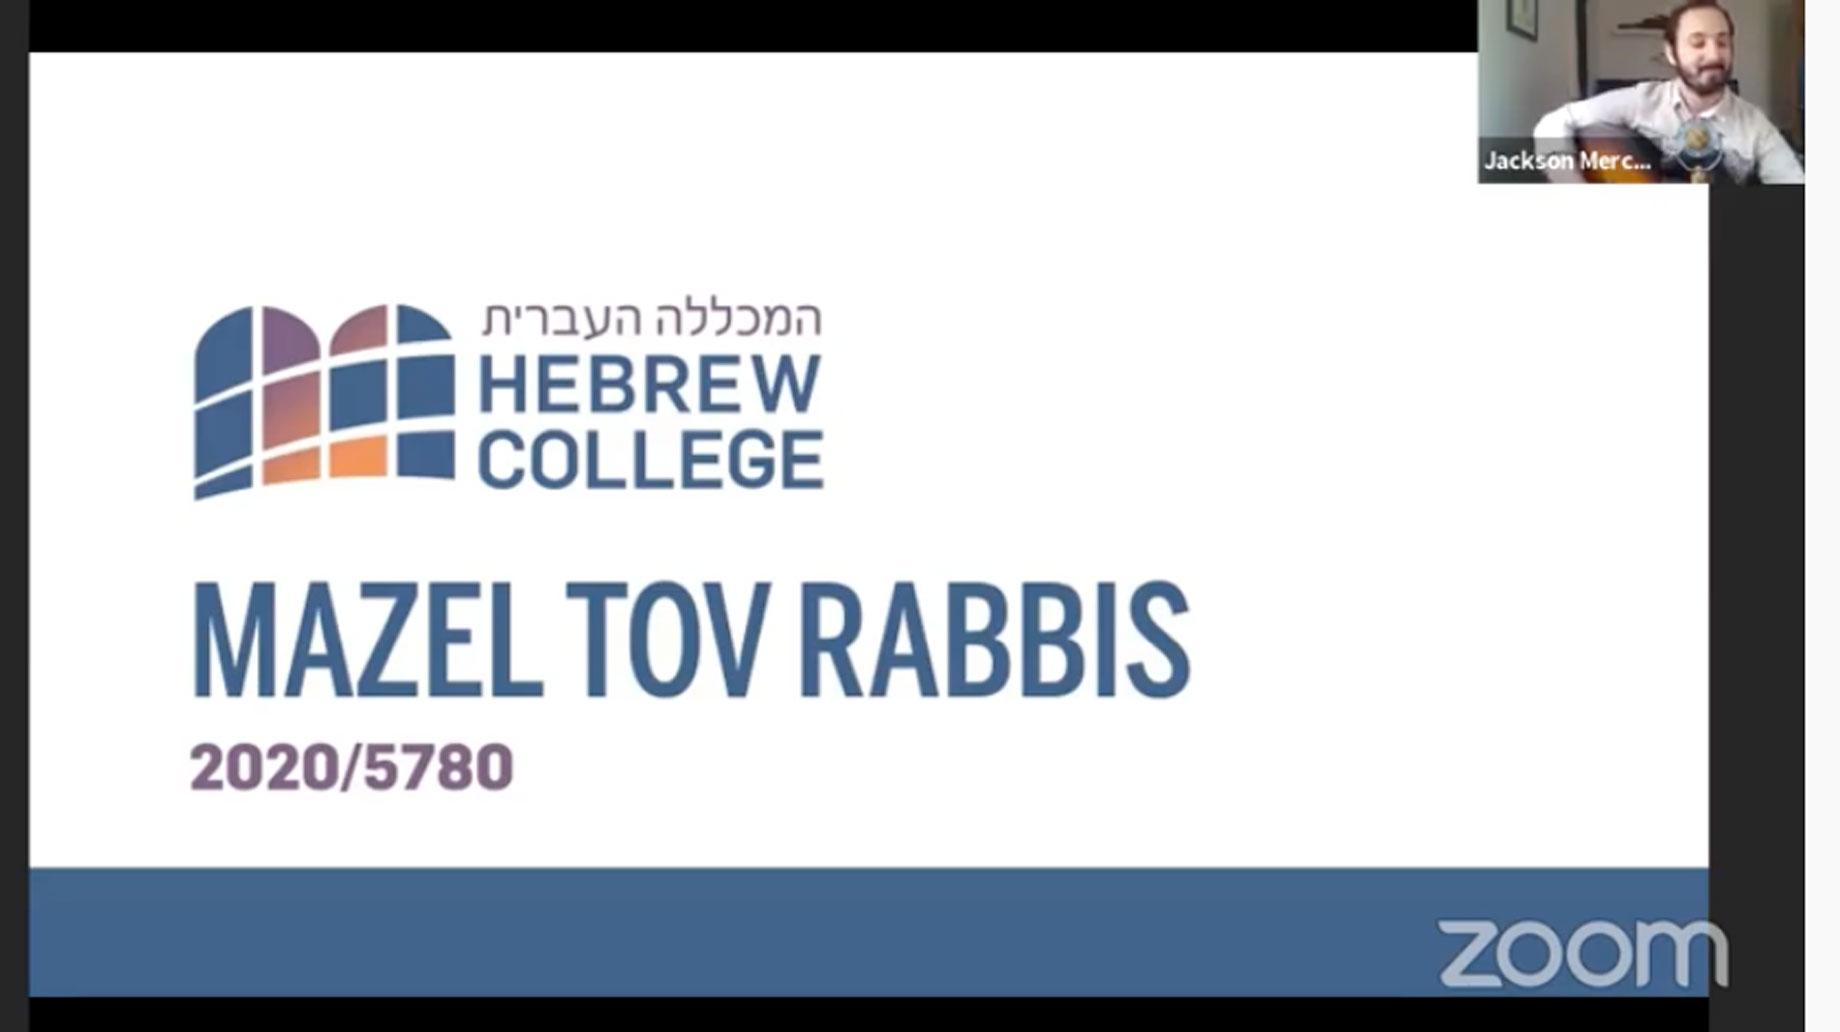 mazel tov rabbis slide